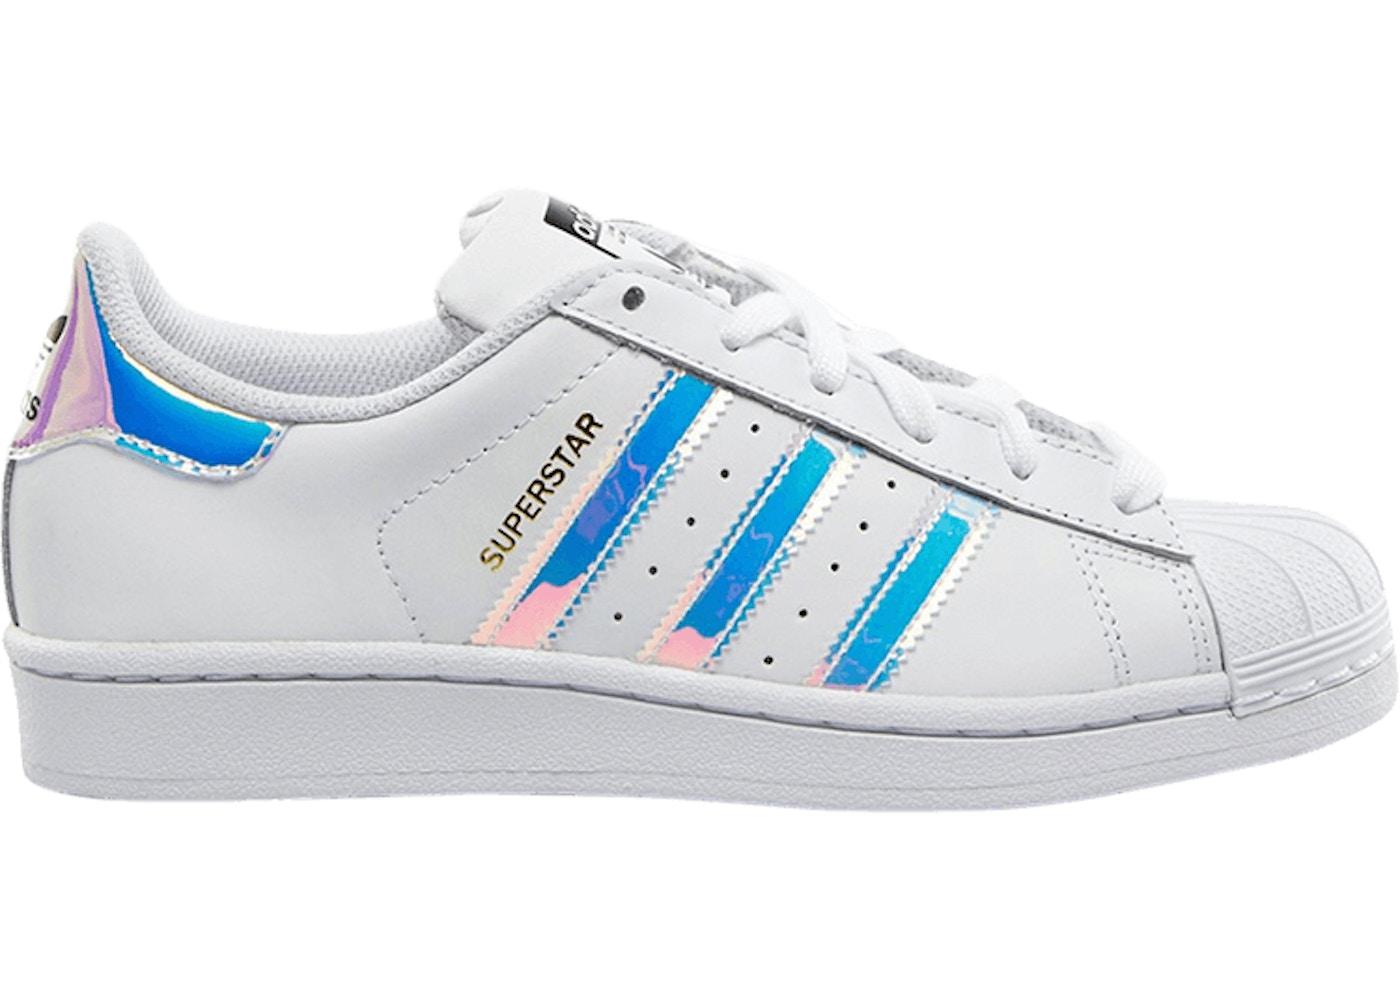 adidas Superstar White Iridescent (Youth) - AQ6278